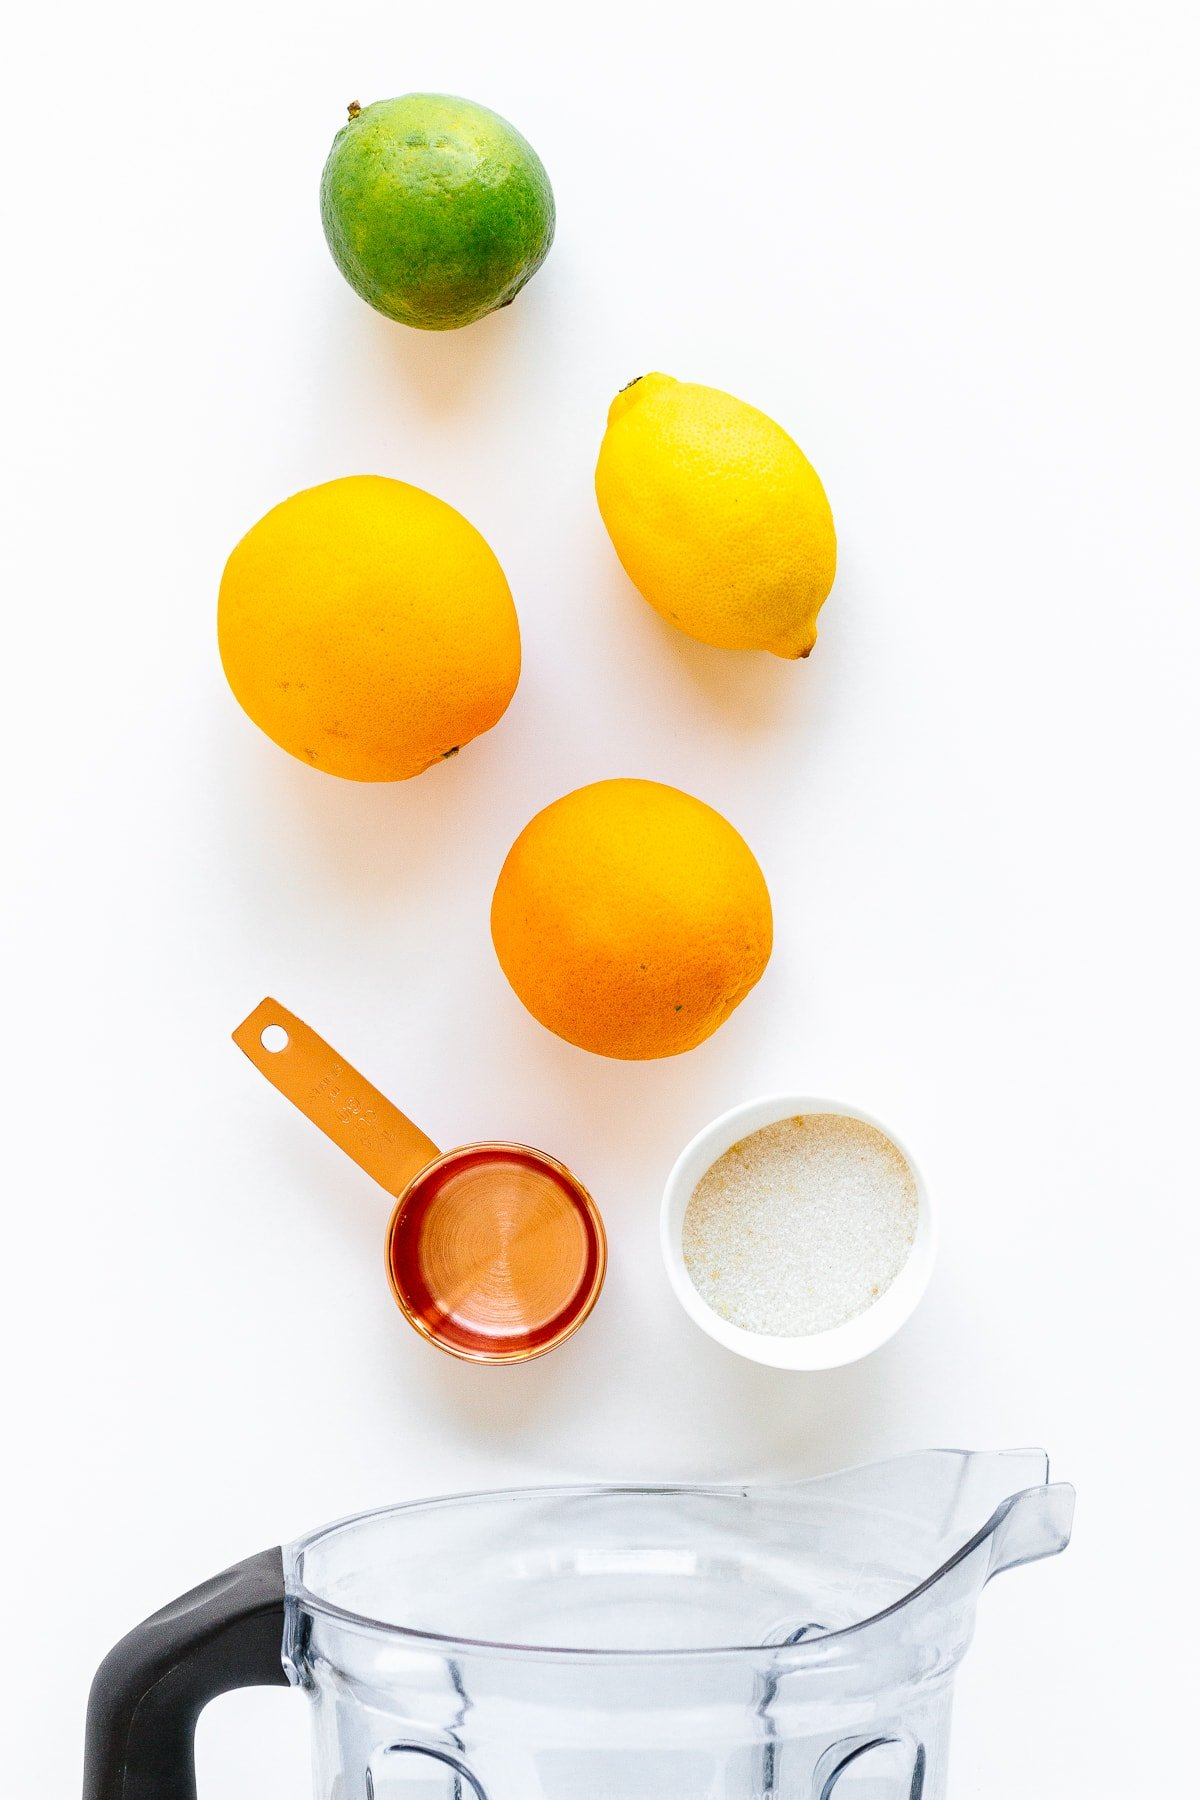 Overhead photo of ingredients needed to make orange lemon lime popsicles.